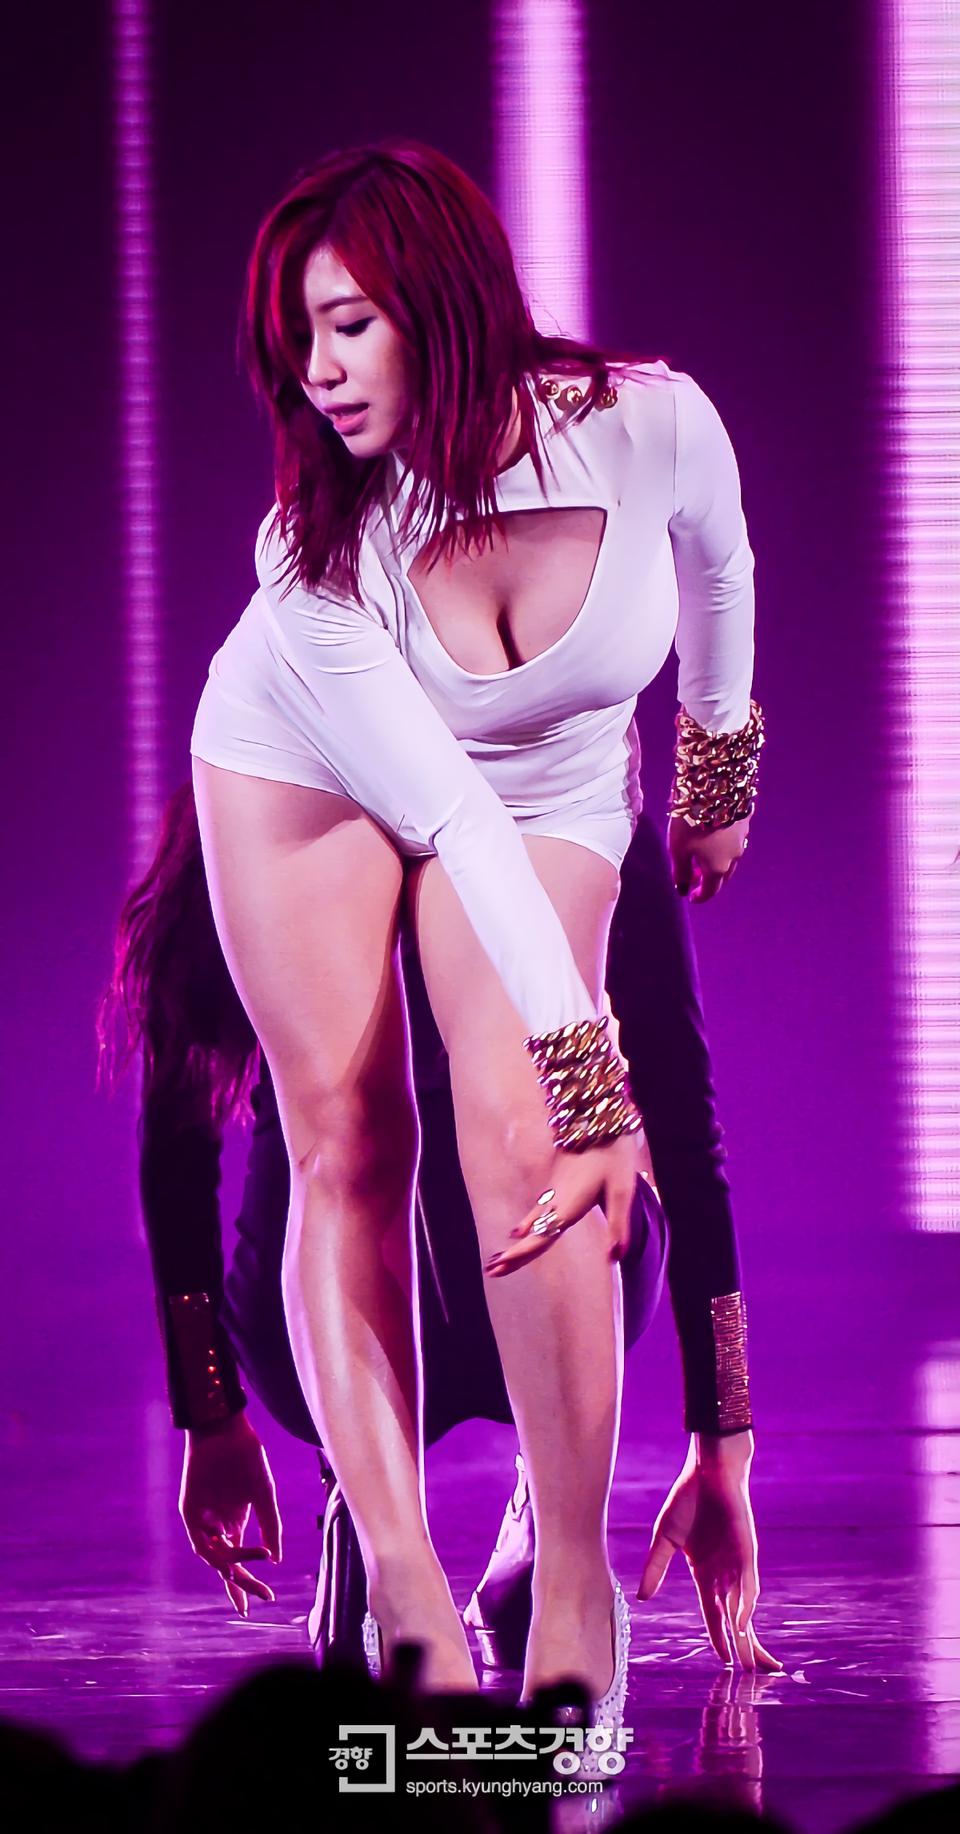 Secret S Jun Hyoseong Compilation Album Kpop Girls Female Dancers Hyosung Secret